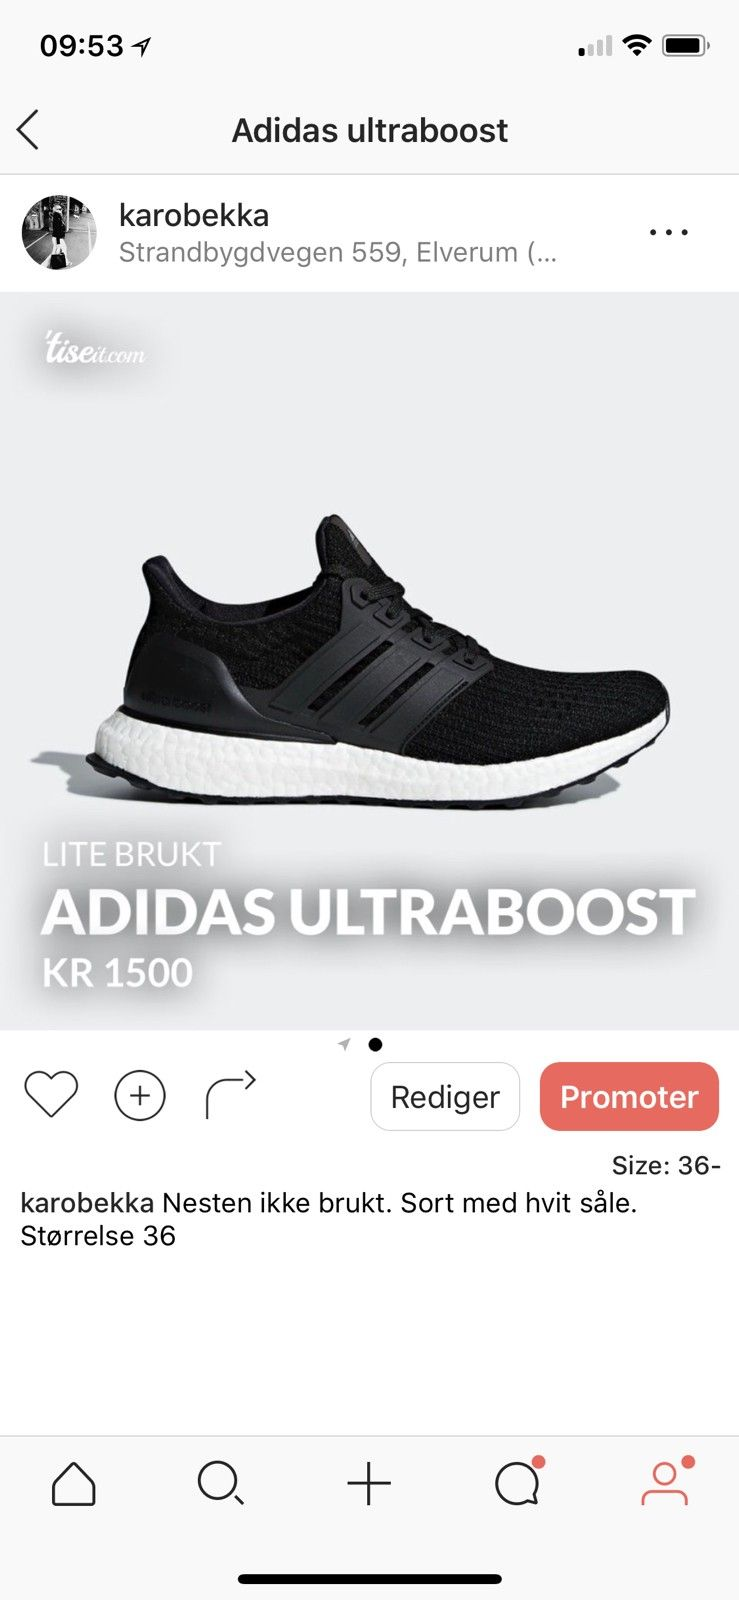 Adidas ultraboost | FINN.no